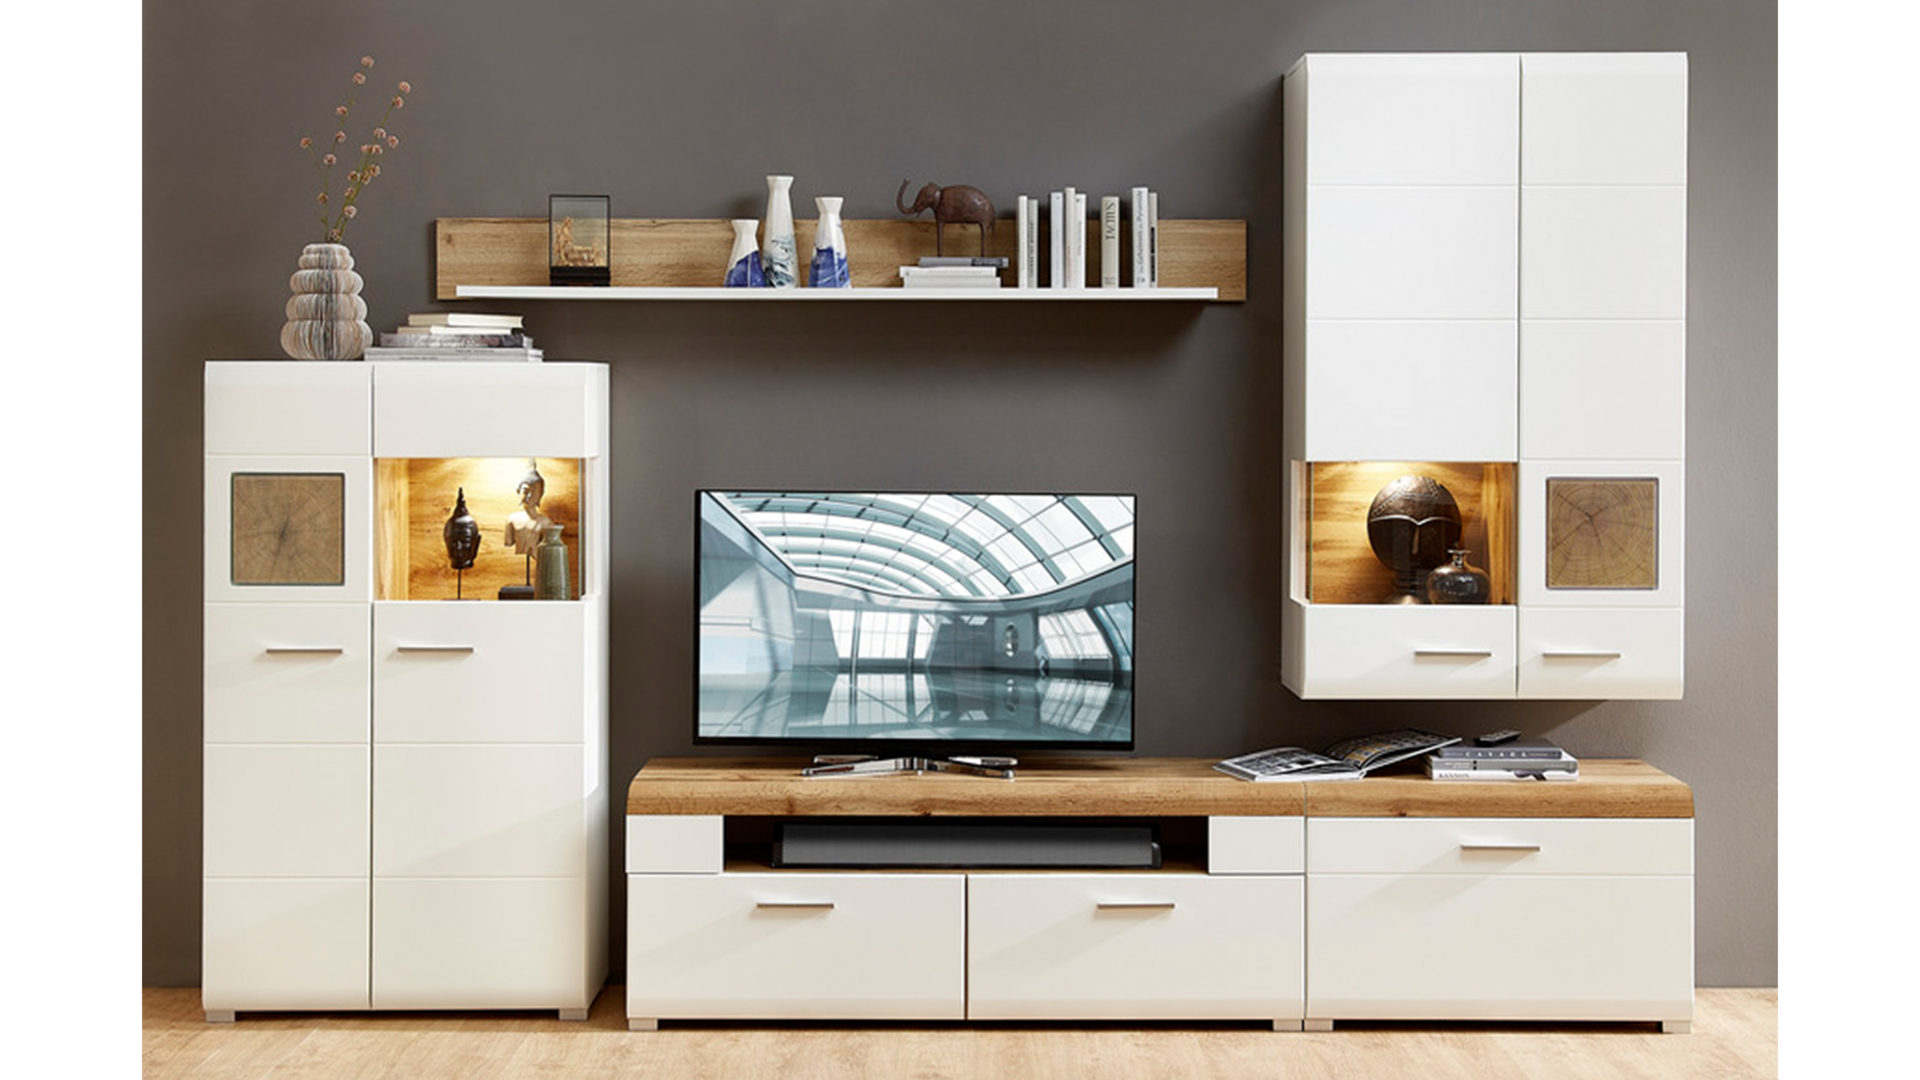 Wohnwand Weie Holz ~ Wohnwand holz modern weiß günstig kaufen bei yatego